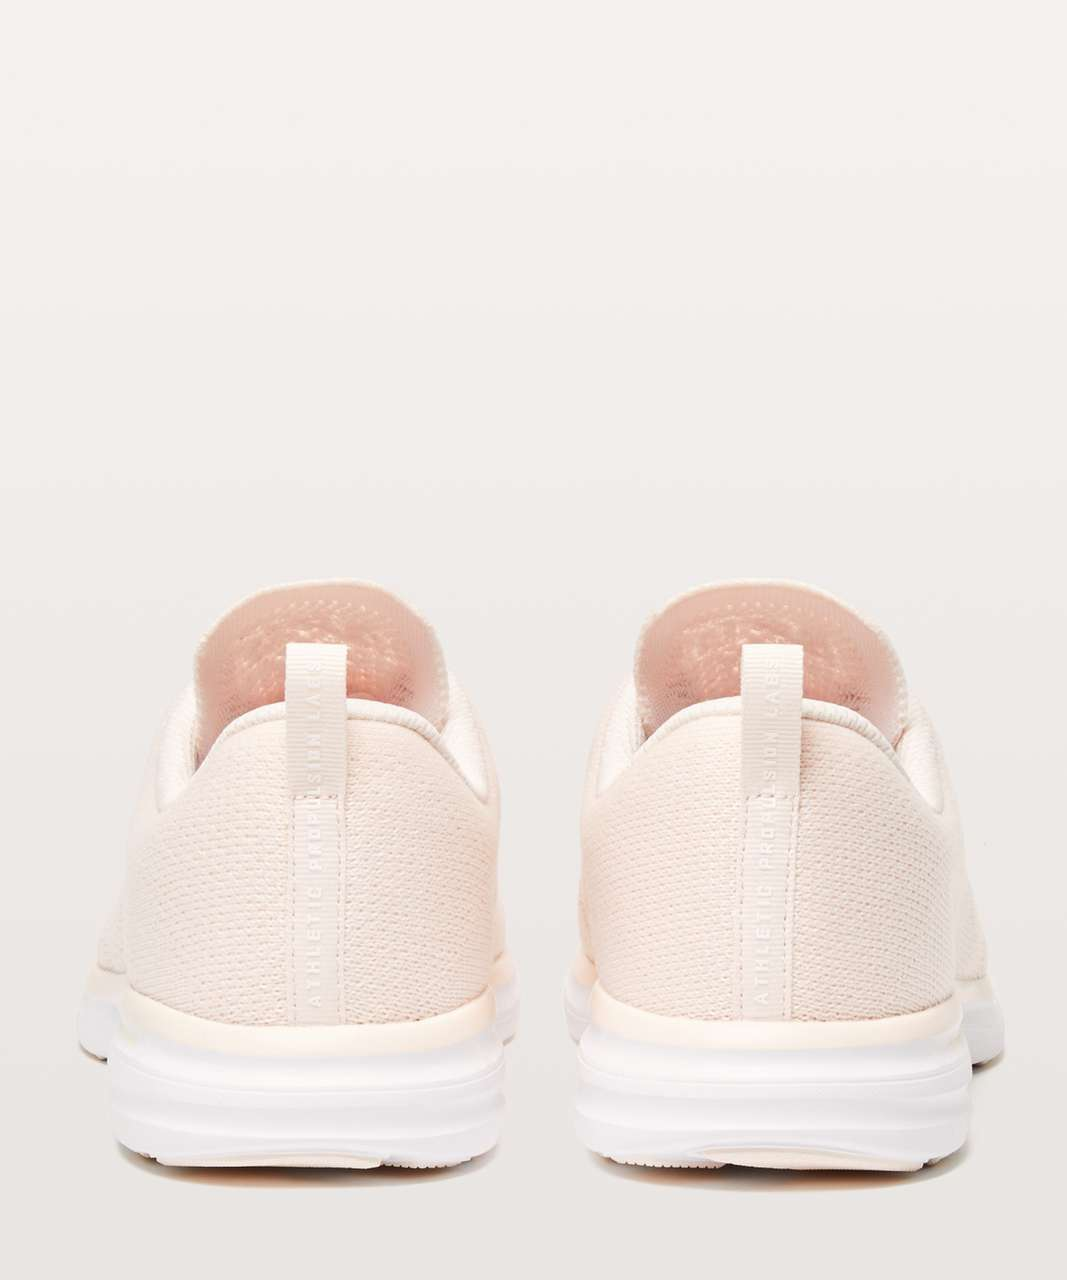 Lululemon Womens TechLoom Pro Shoe *Cashmere - Nude Cashmere